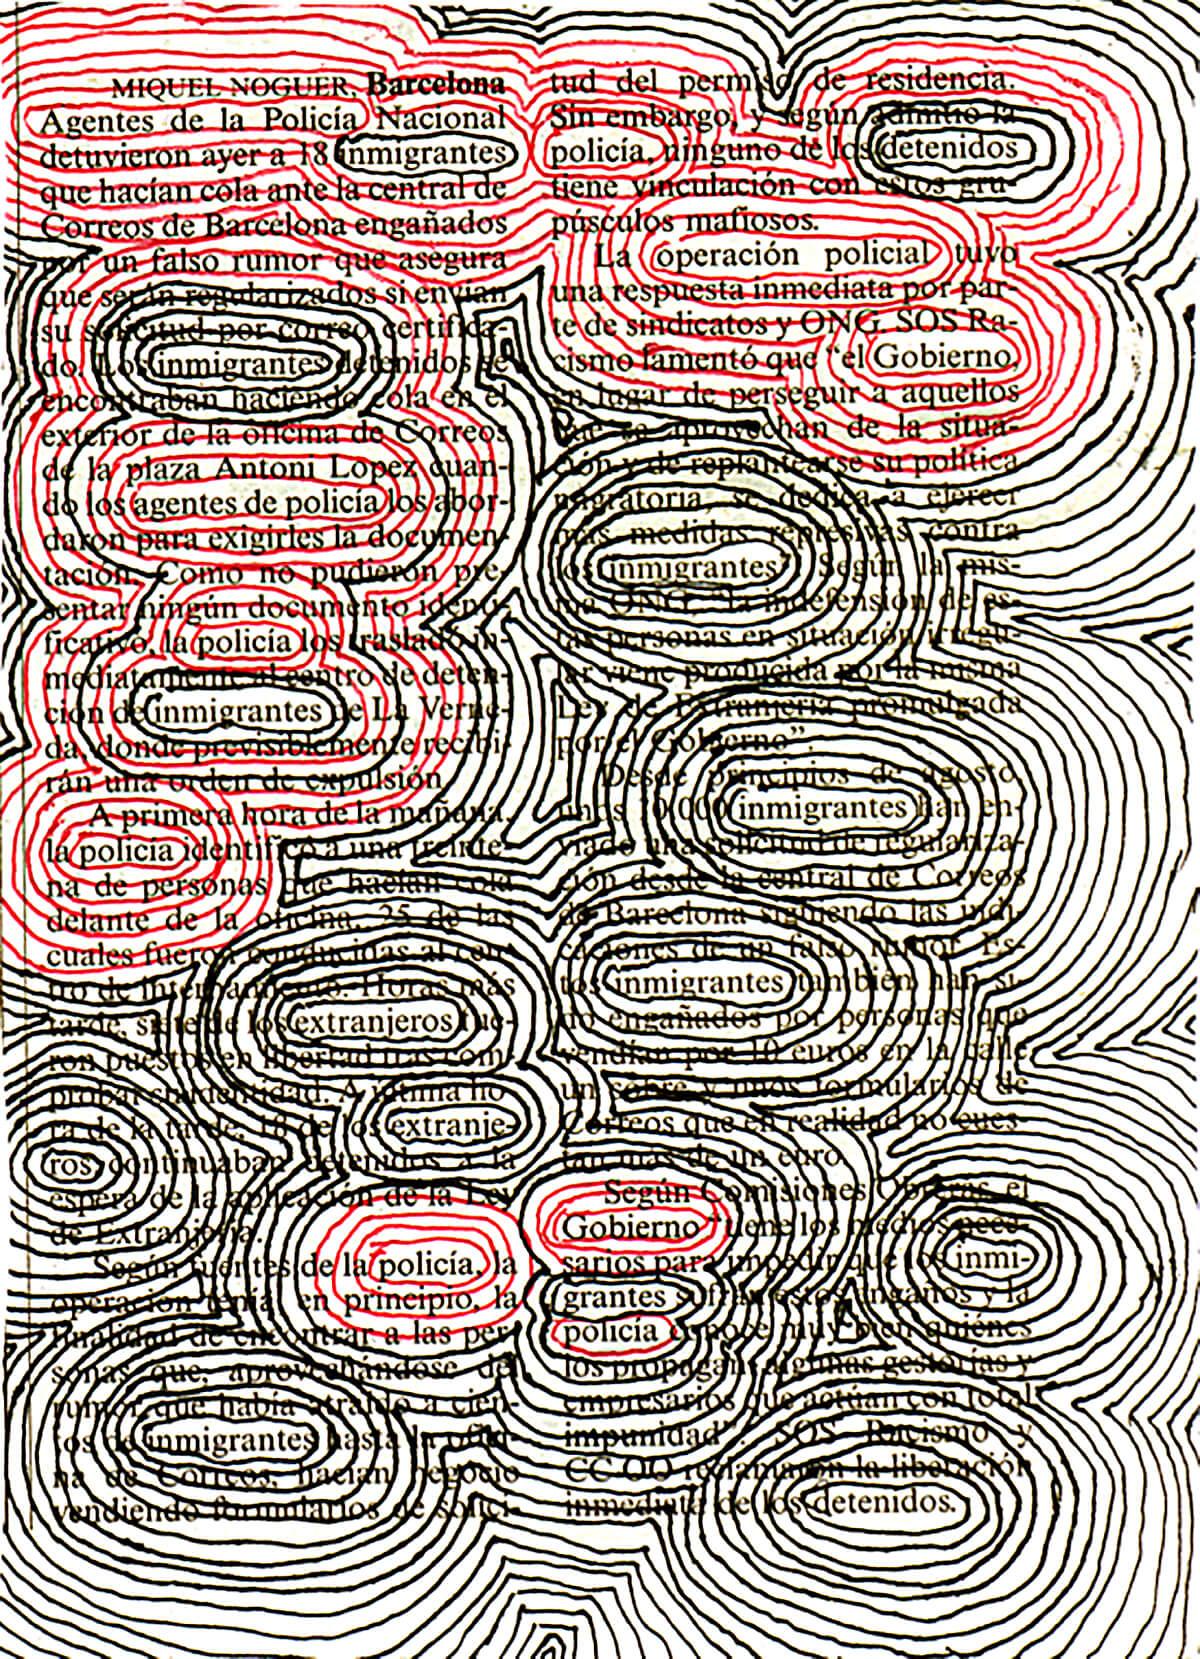 Agentes e inmigrantes, 18 x 26 cm, ink on newspaper, 2008